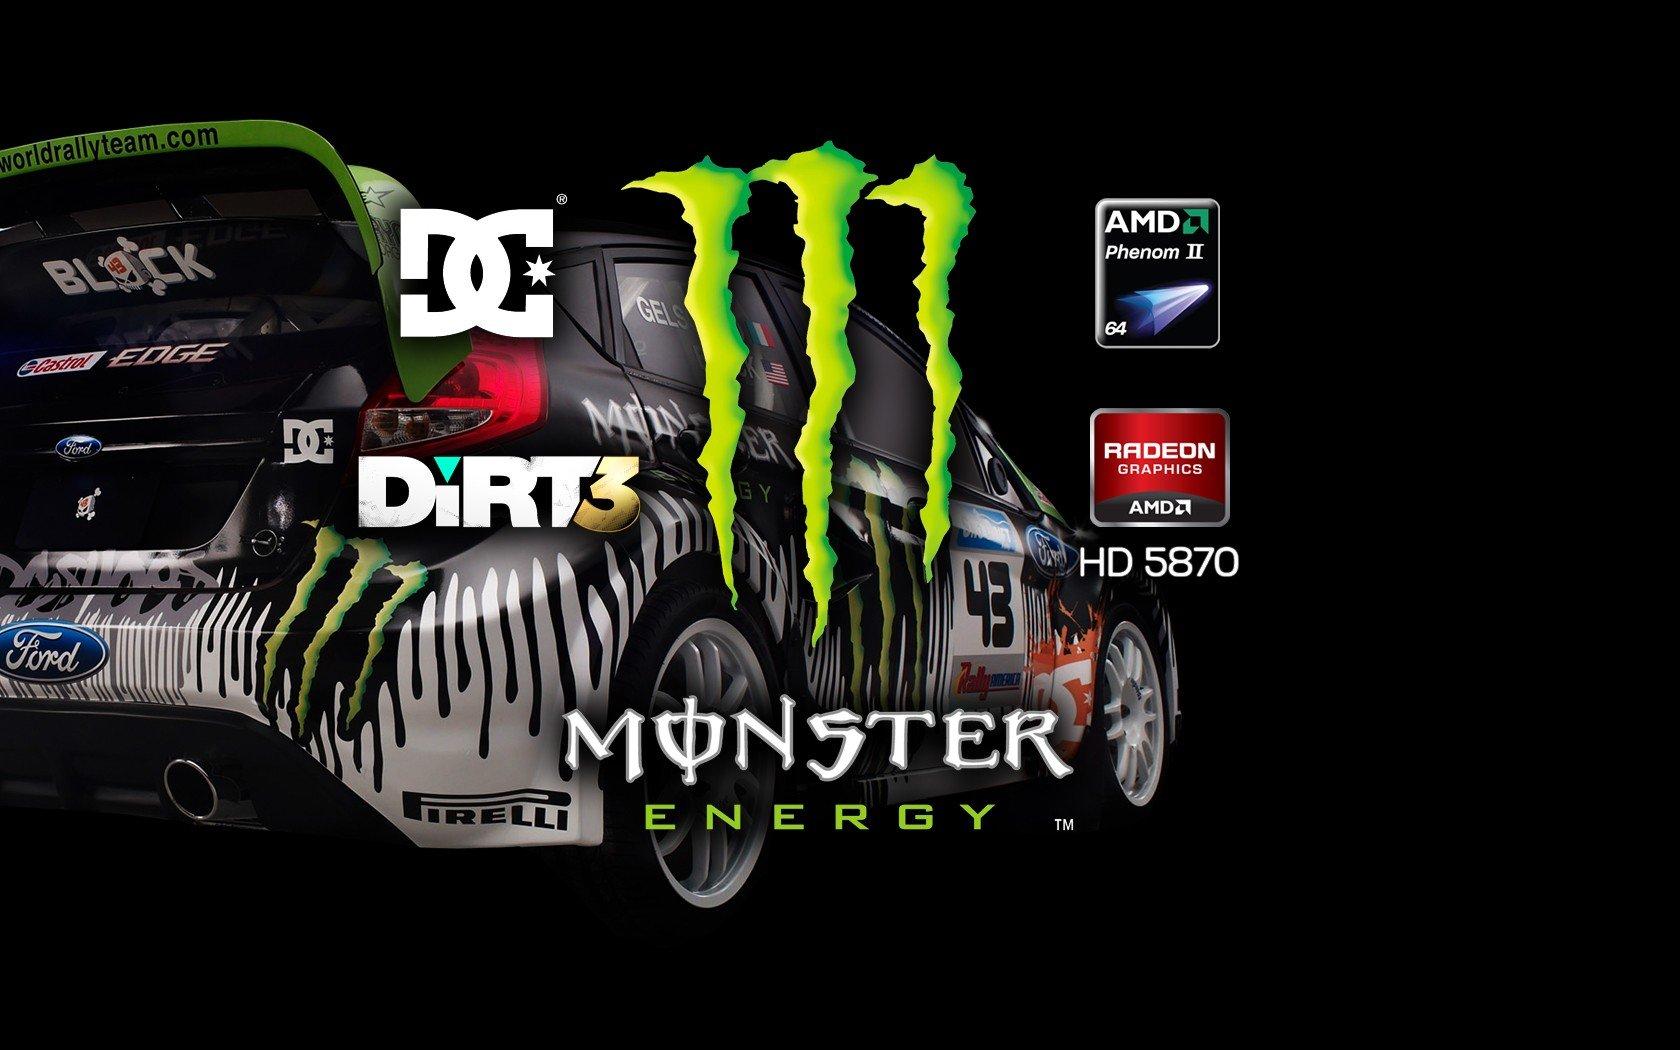 video games cars ken block ati radeon codemasters amd dirt 3 monster